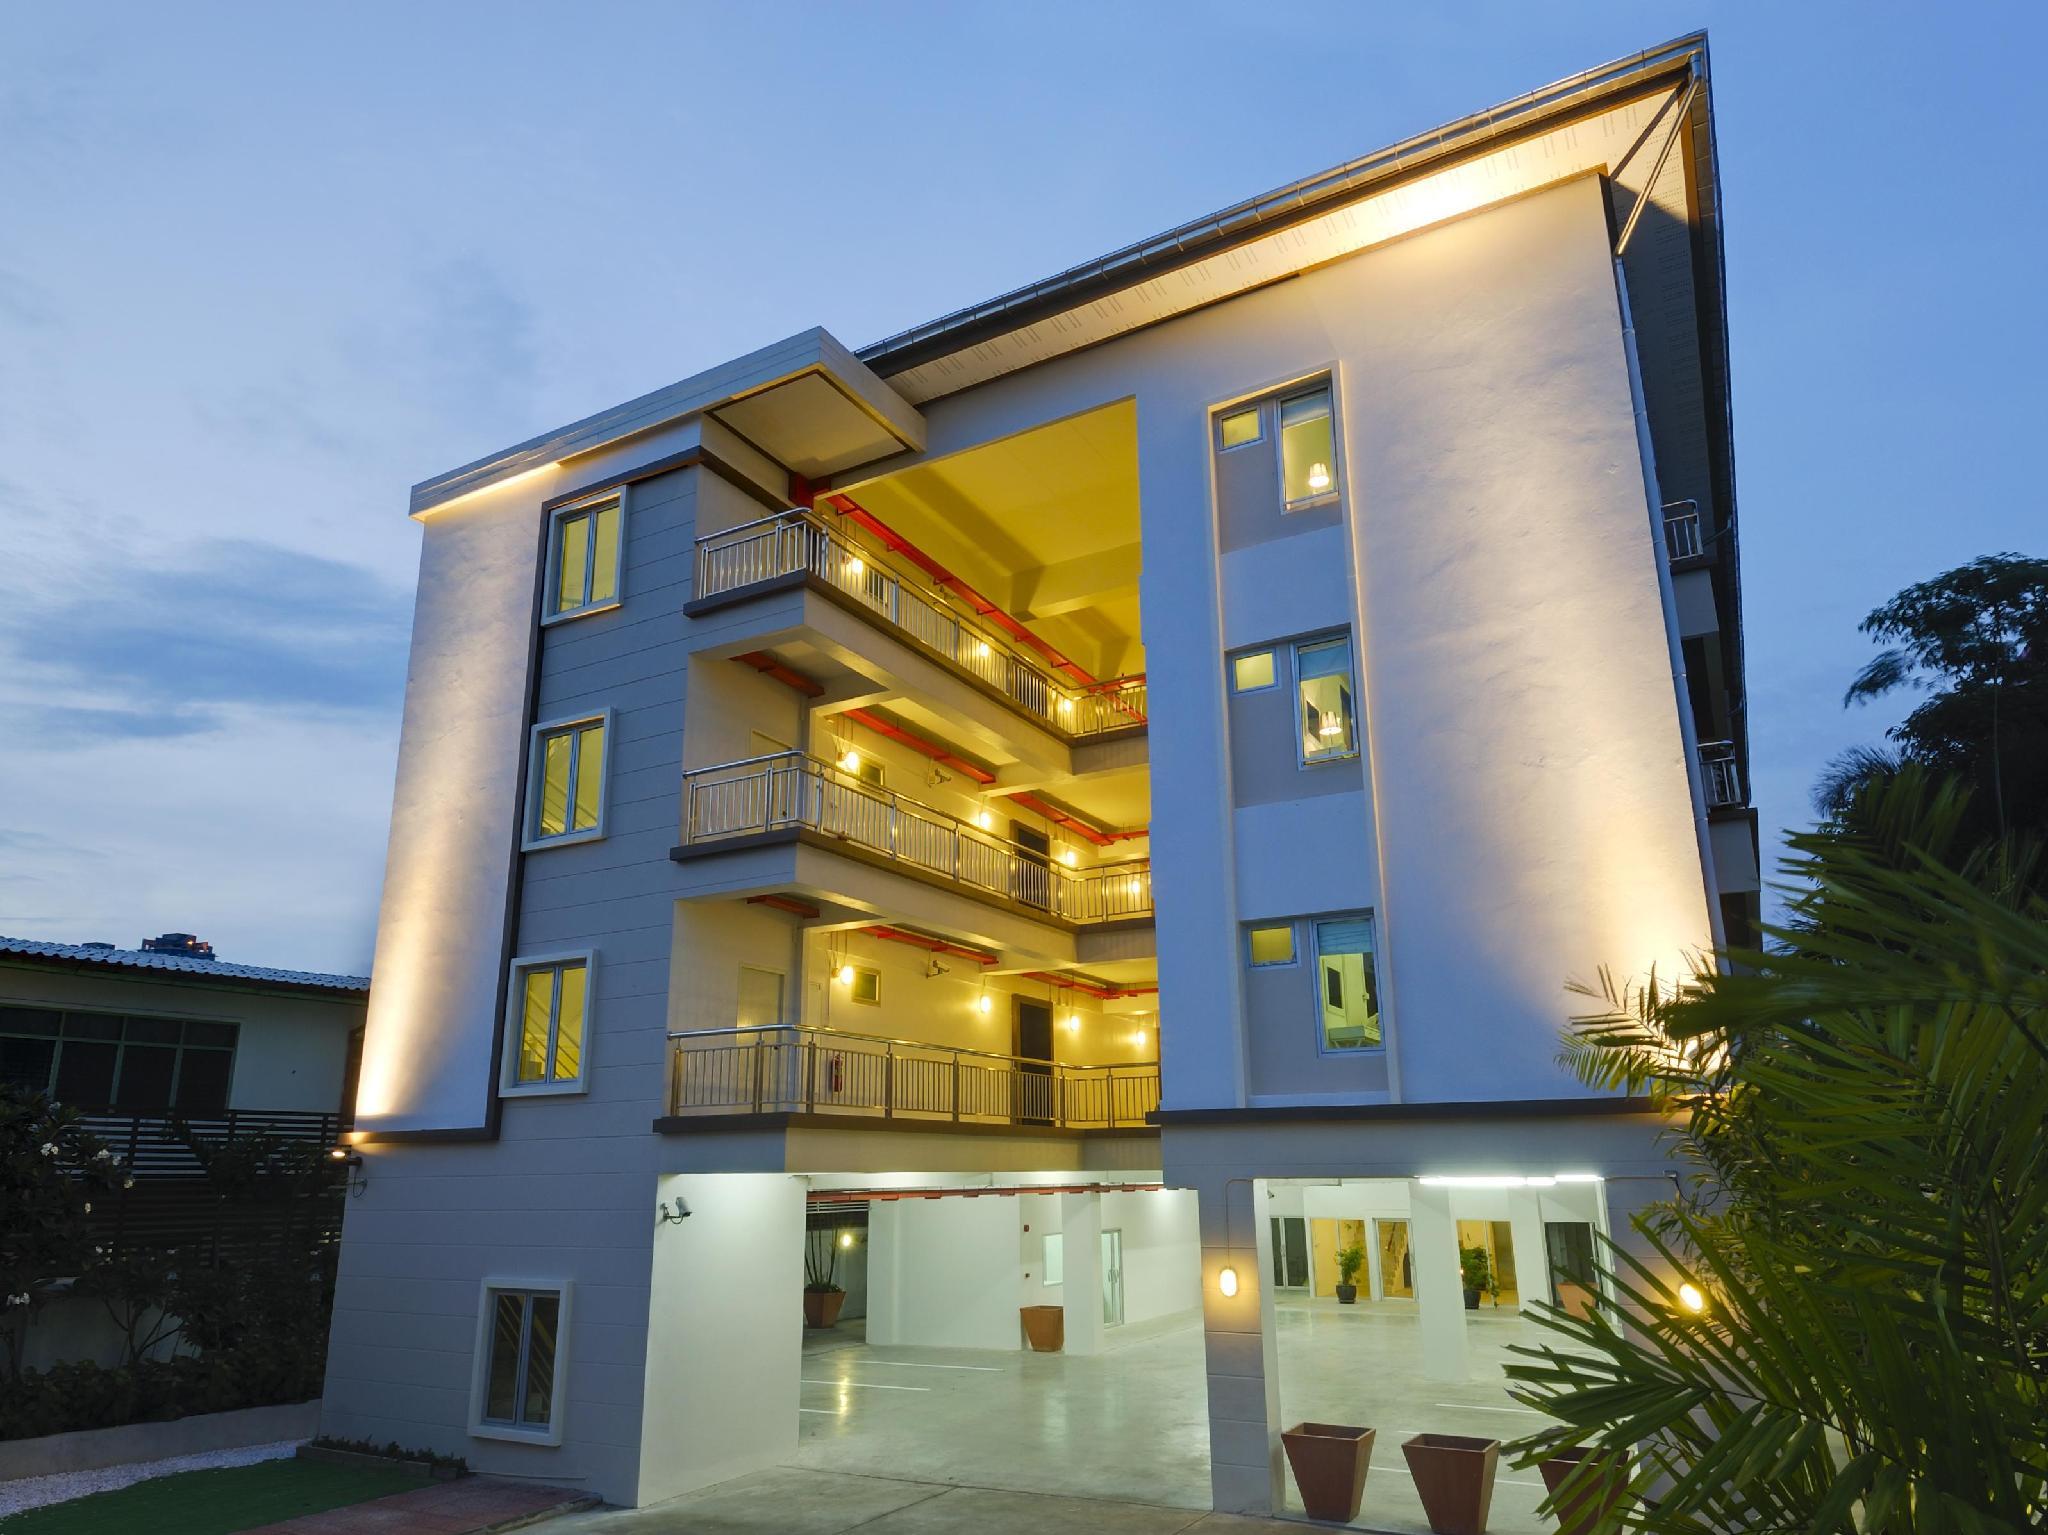 T Series Place Serviced Apartment, Bang Kho Laem